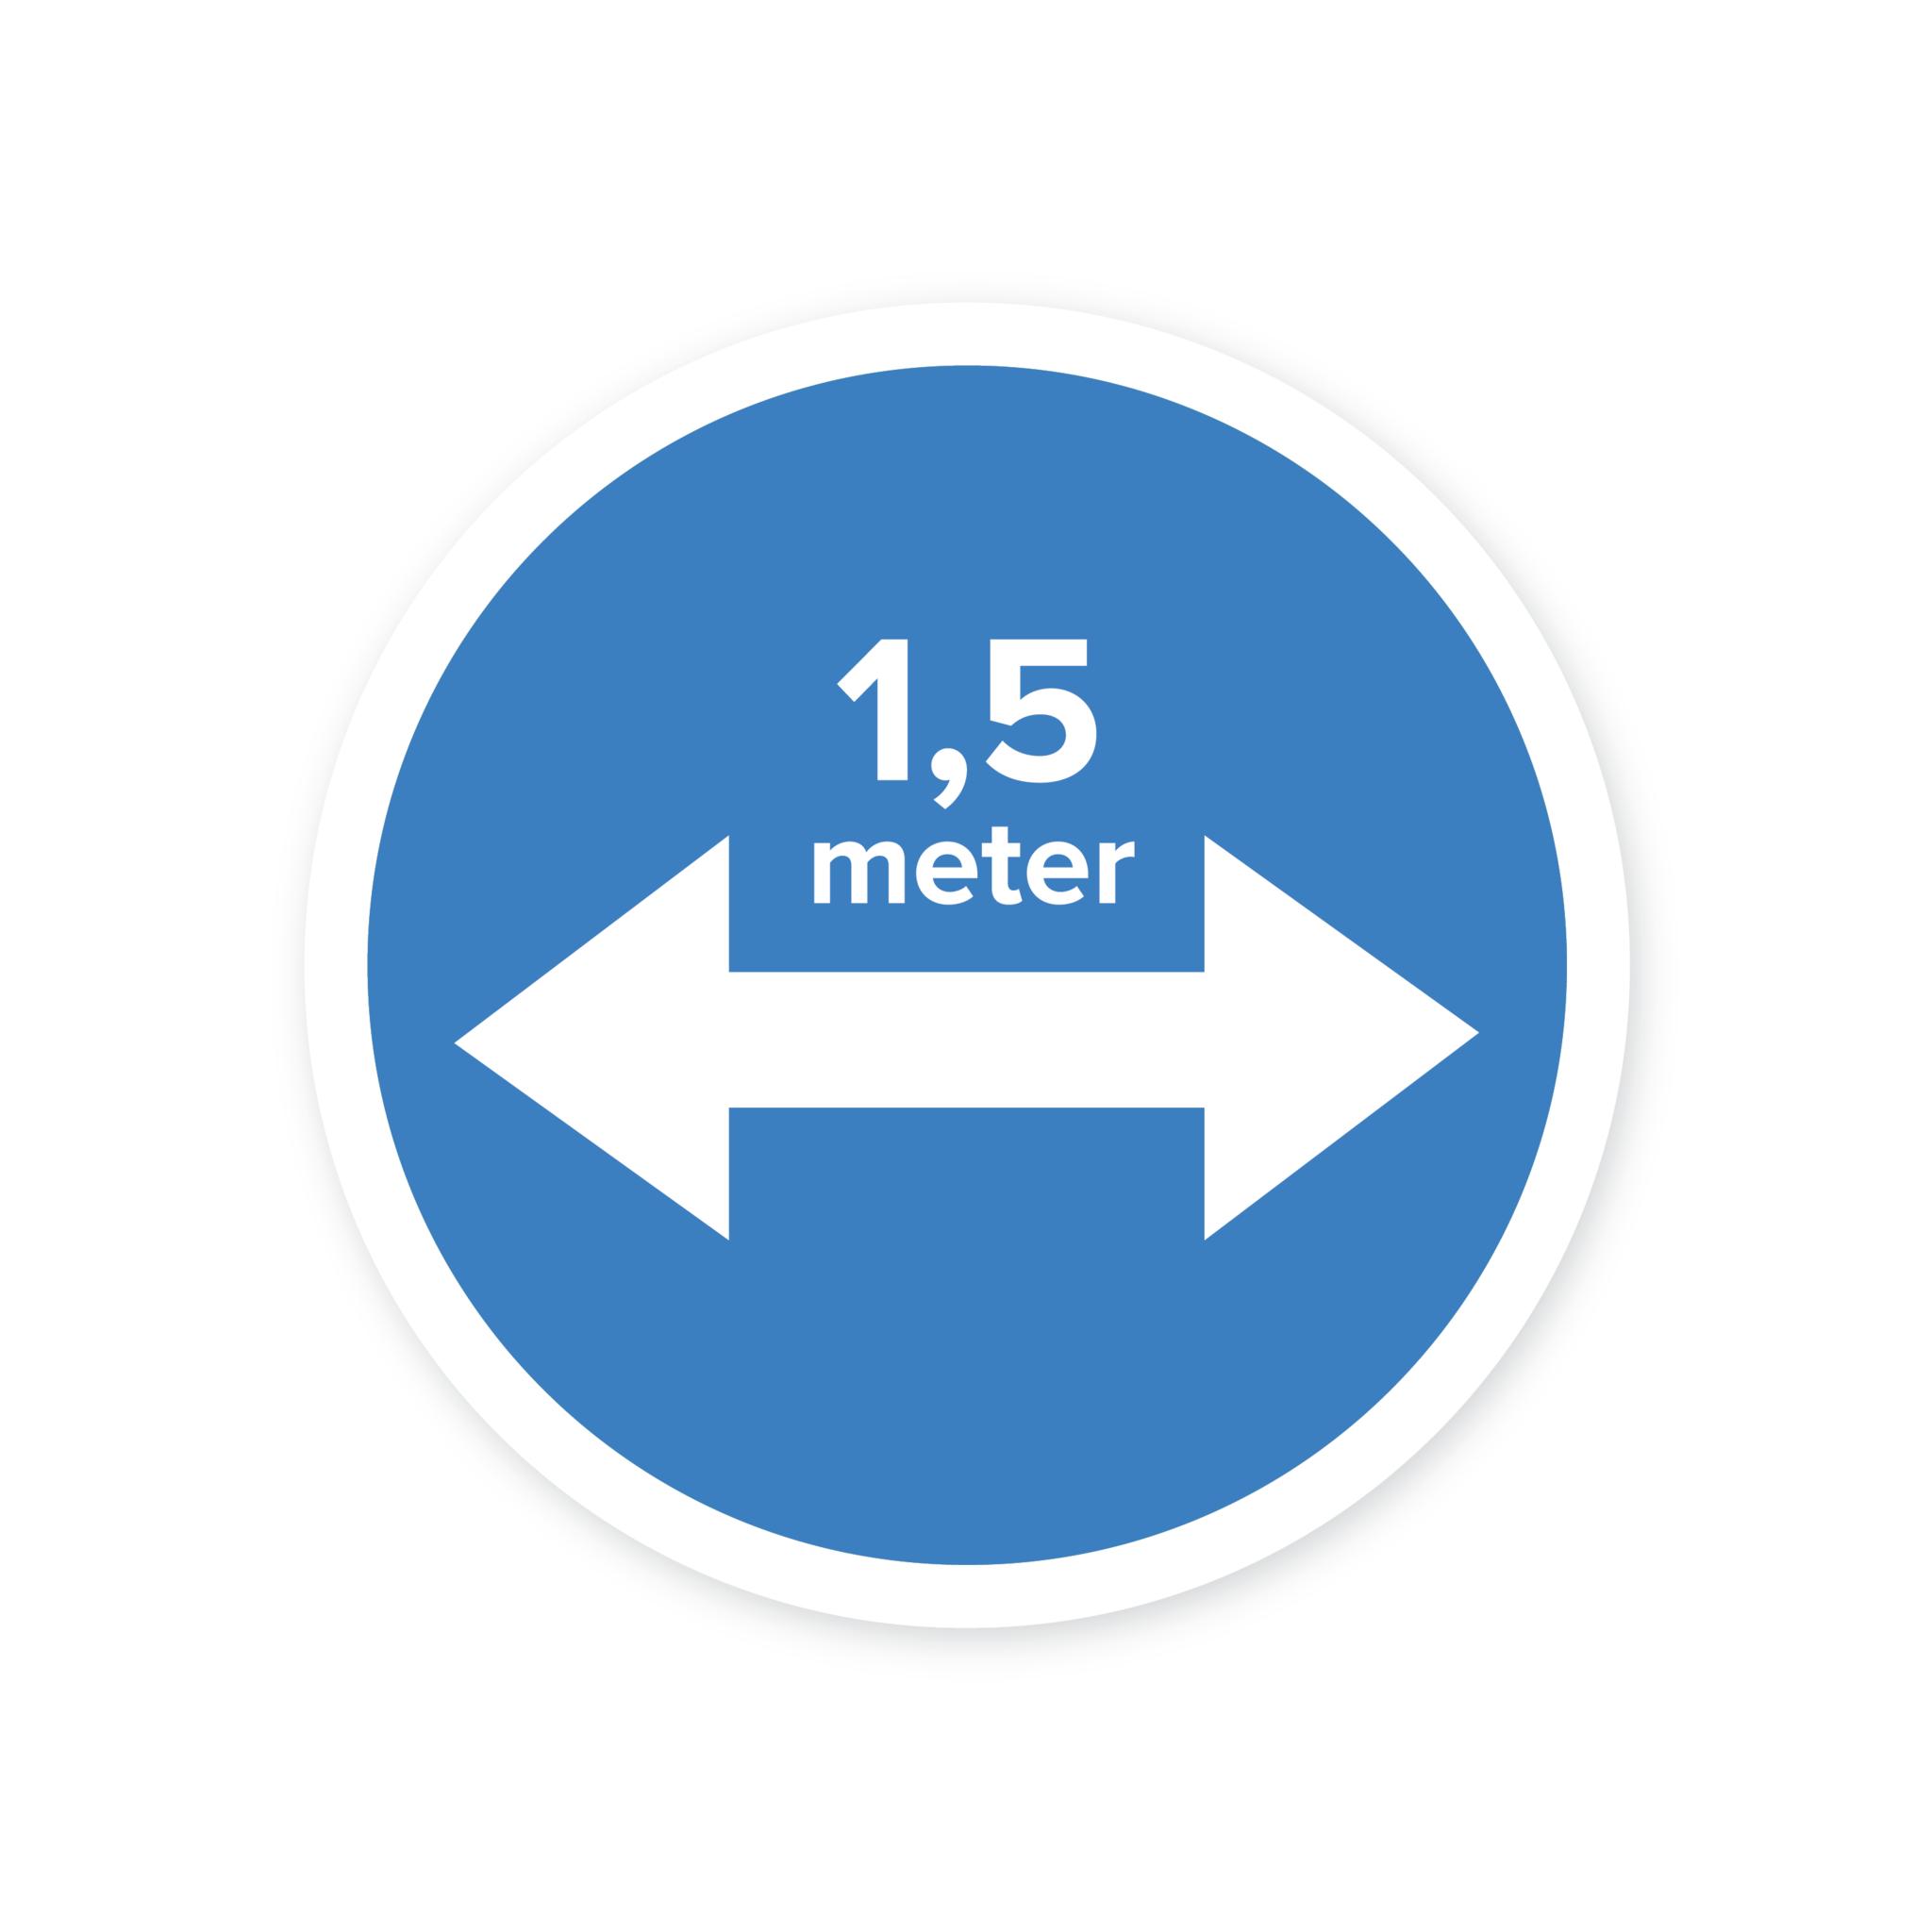 Easydot Wit Mandato de pegatina mantener distancia 1,5 mtr